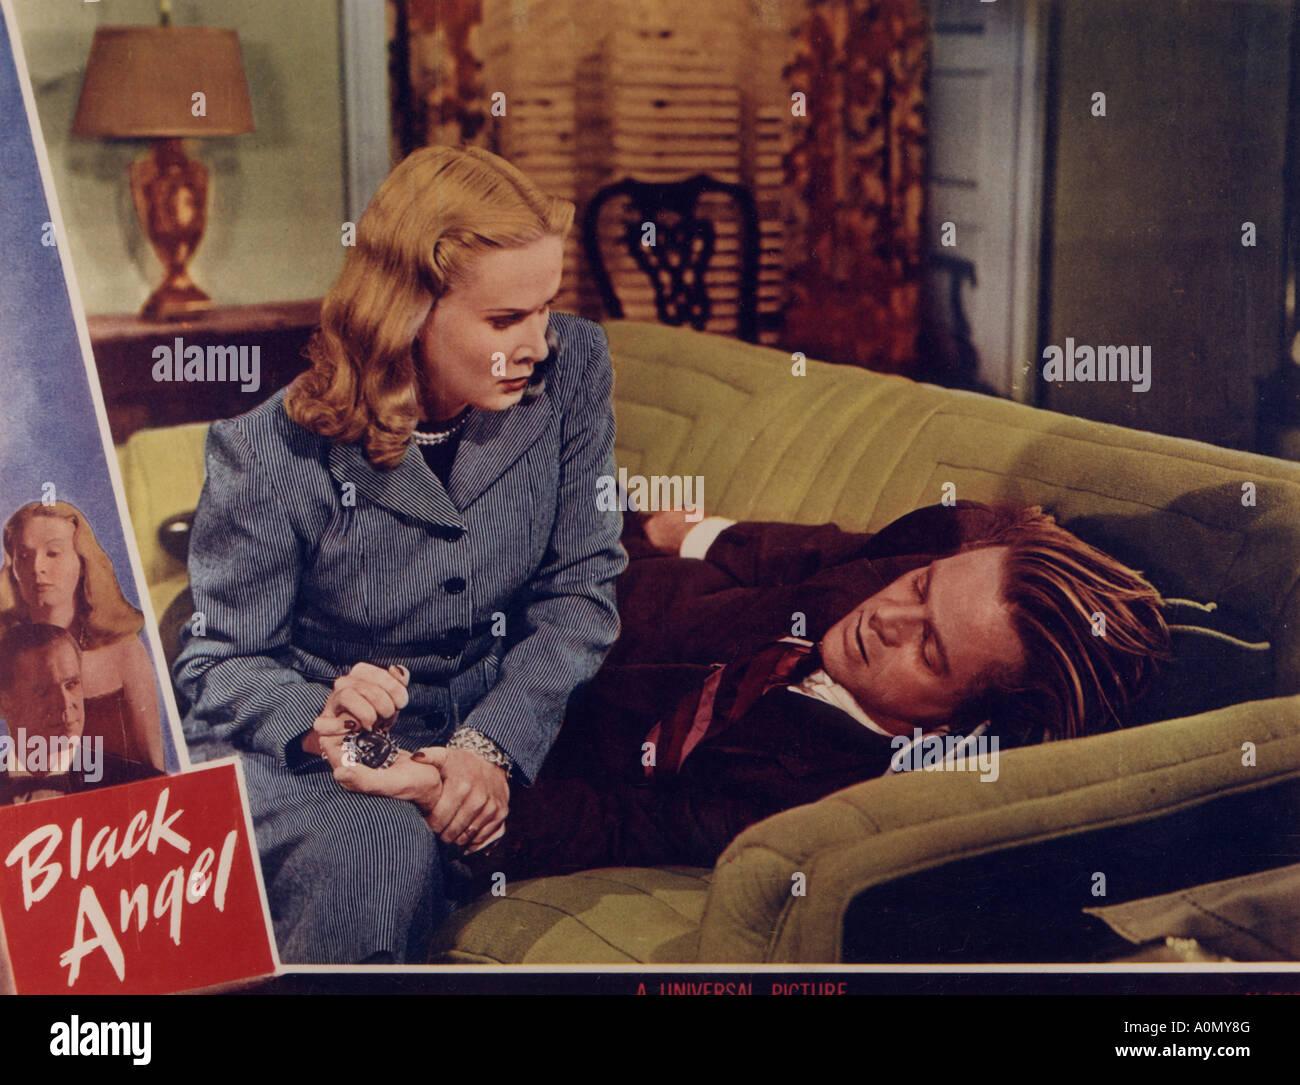 BLACK ANGEL 1946 U-I film with Dan Duryea and June Vincent - Stock Image